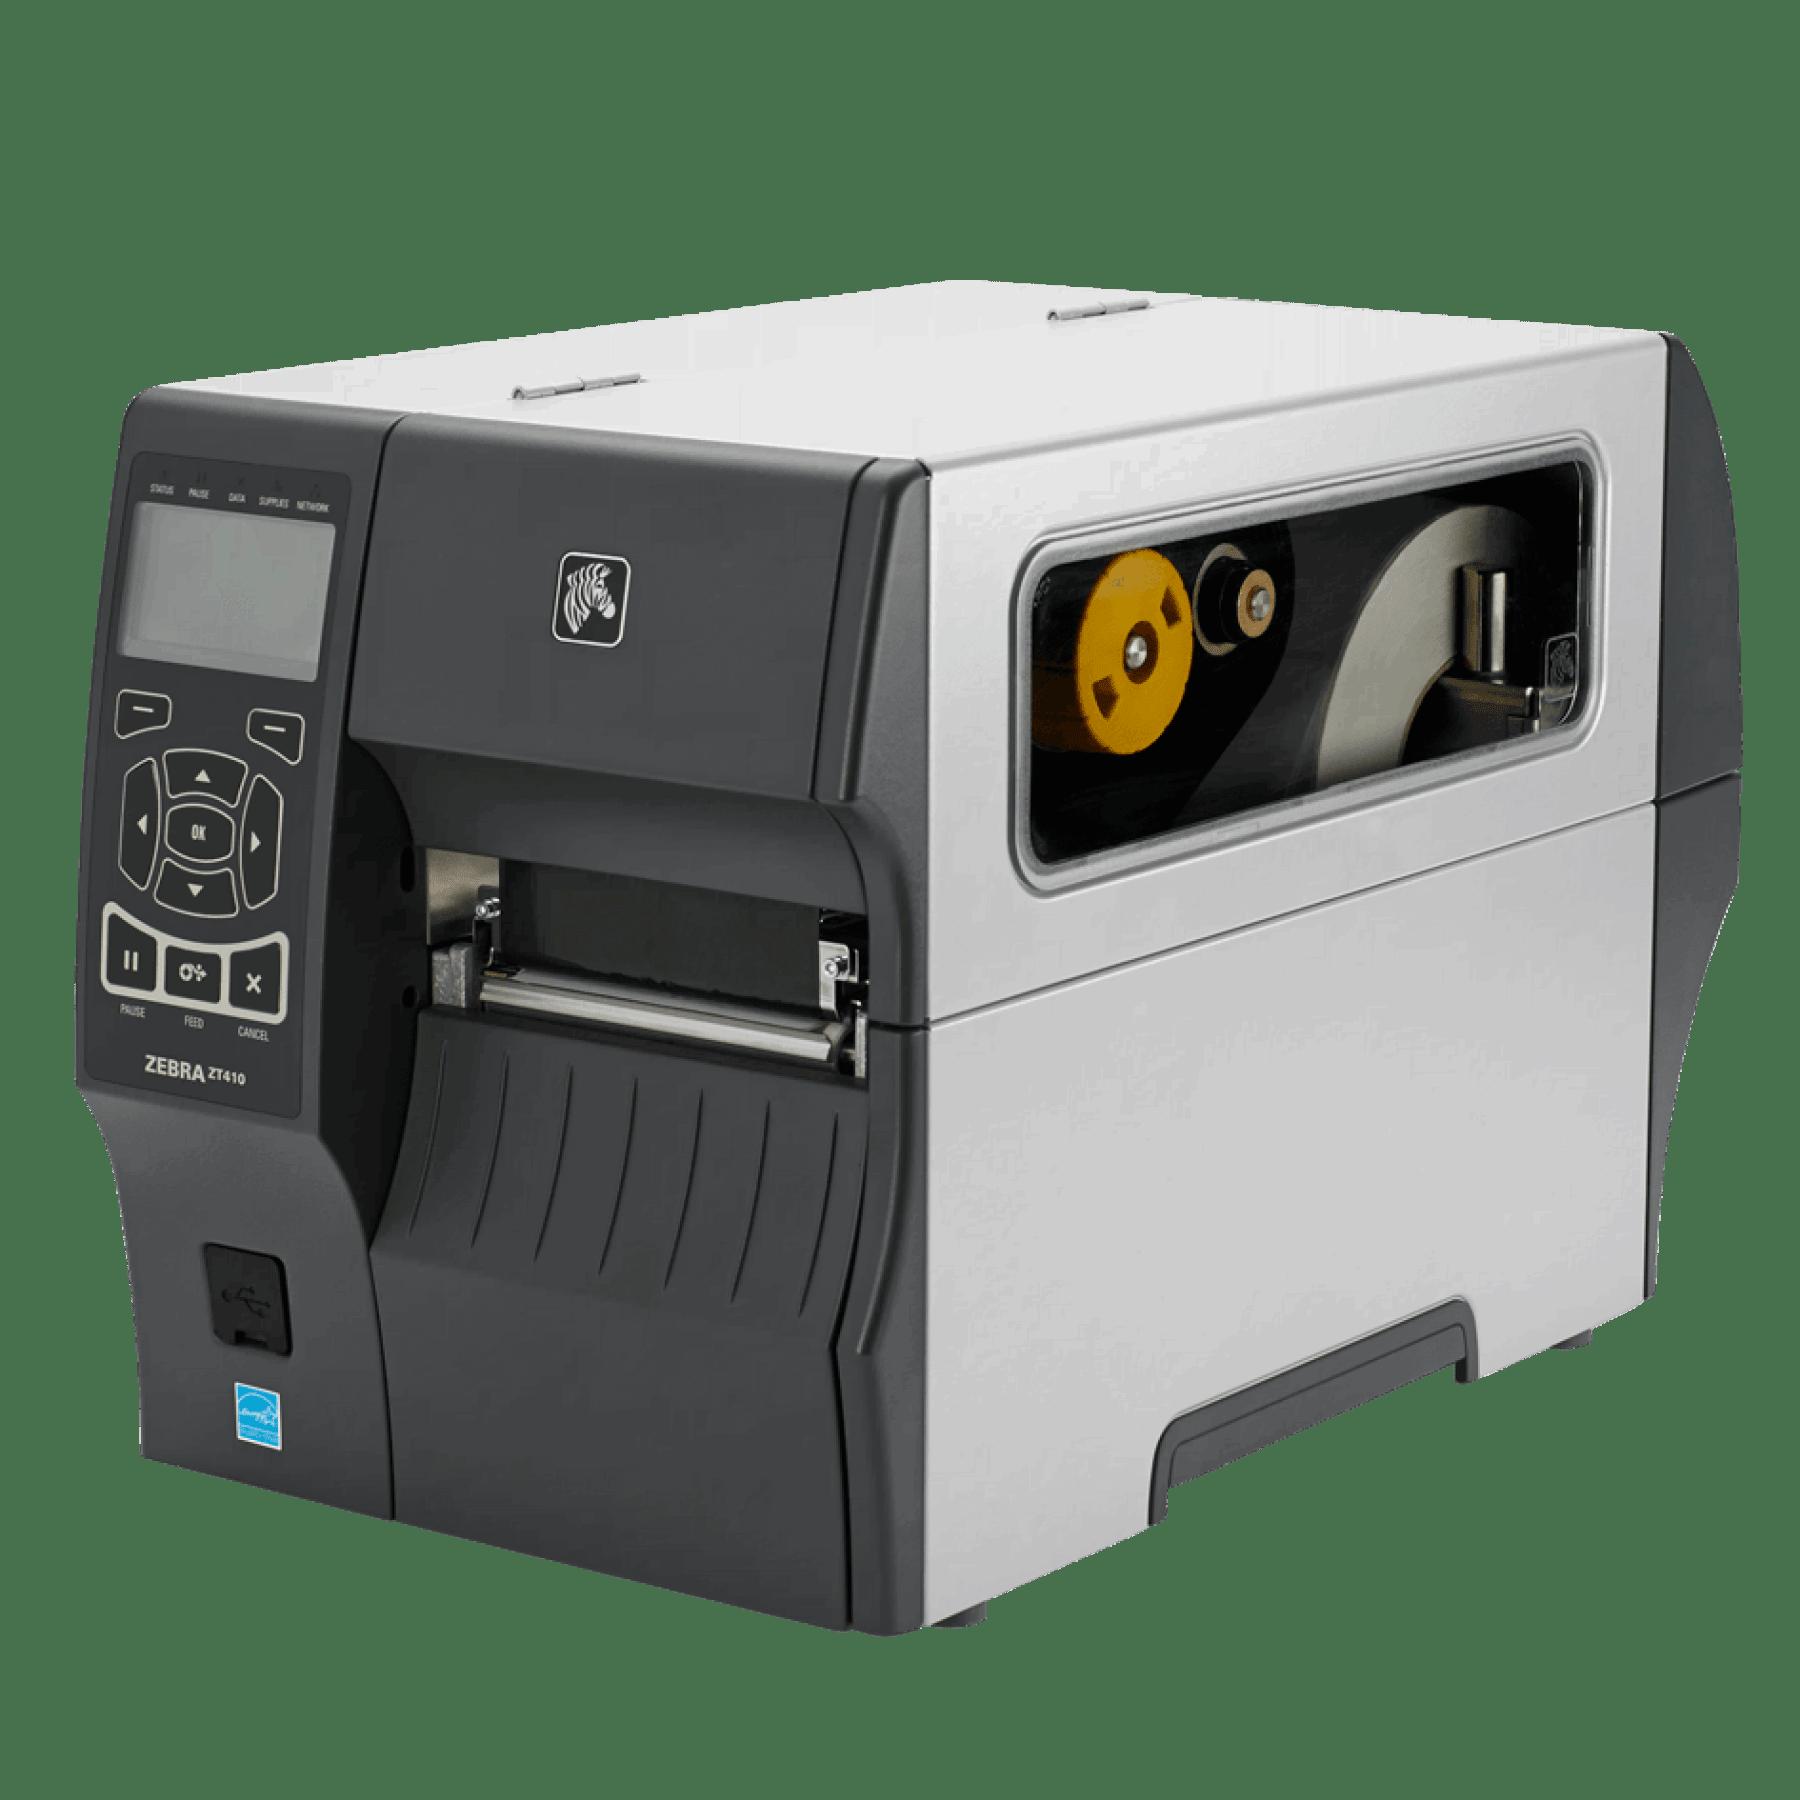 serwis drukarek etykiet